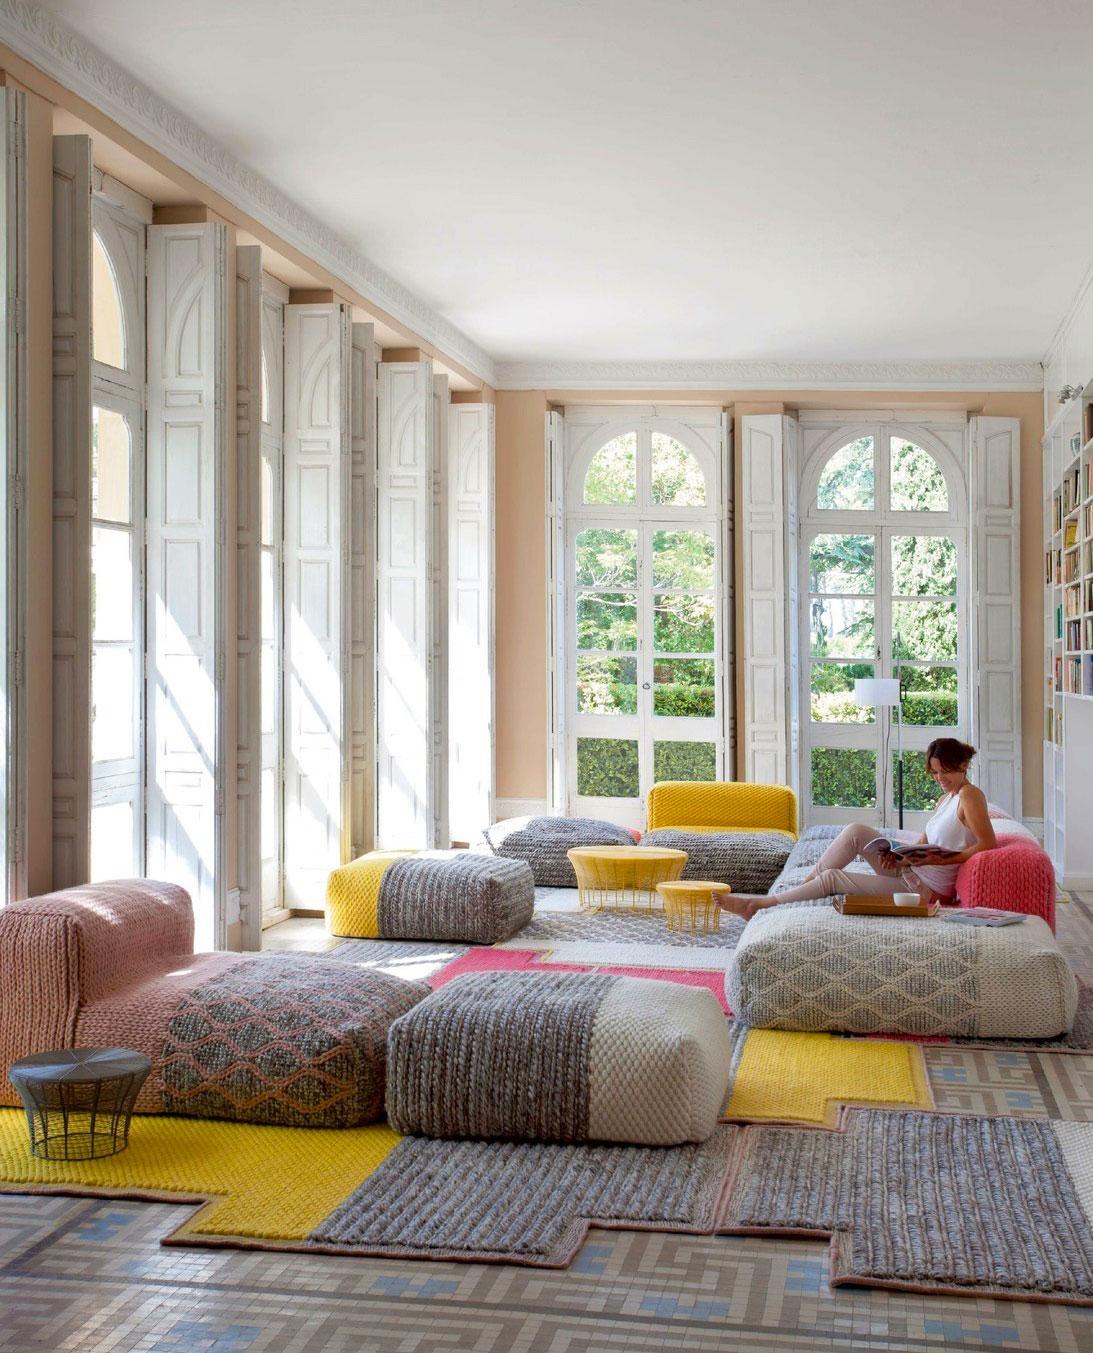 Full Size of Sofa Alternatives Couch For Small Spaces Living Room Togo Uk Bed Best To Sleeper Sofas Crossword Cheap Ikea Ideas 3 Sitzer 2er Arten Brühl Impressionen Kissen Sofa Sofa Alternatives